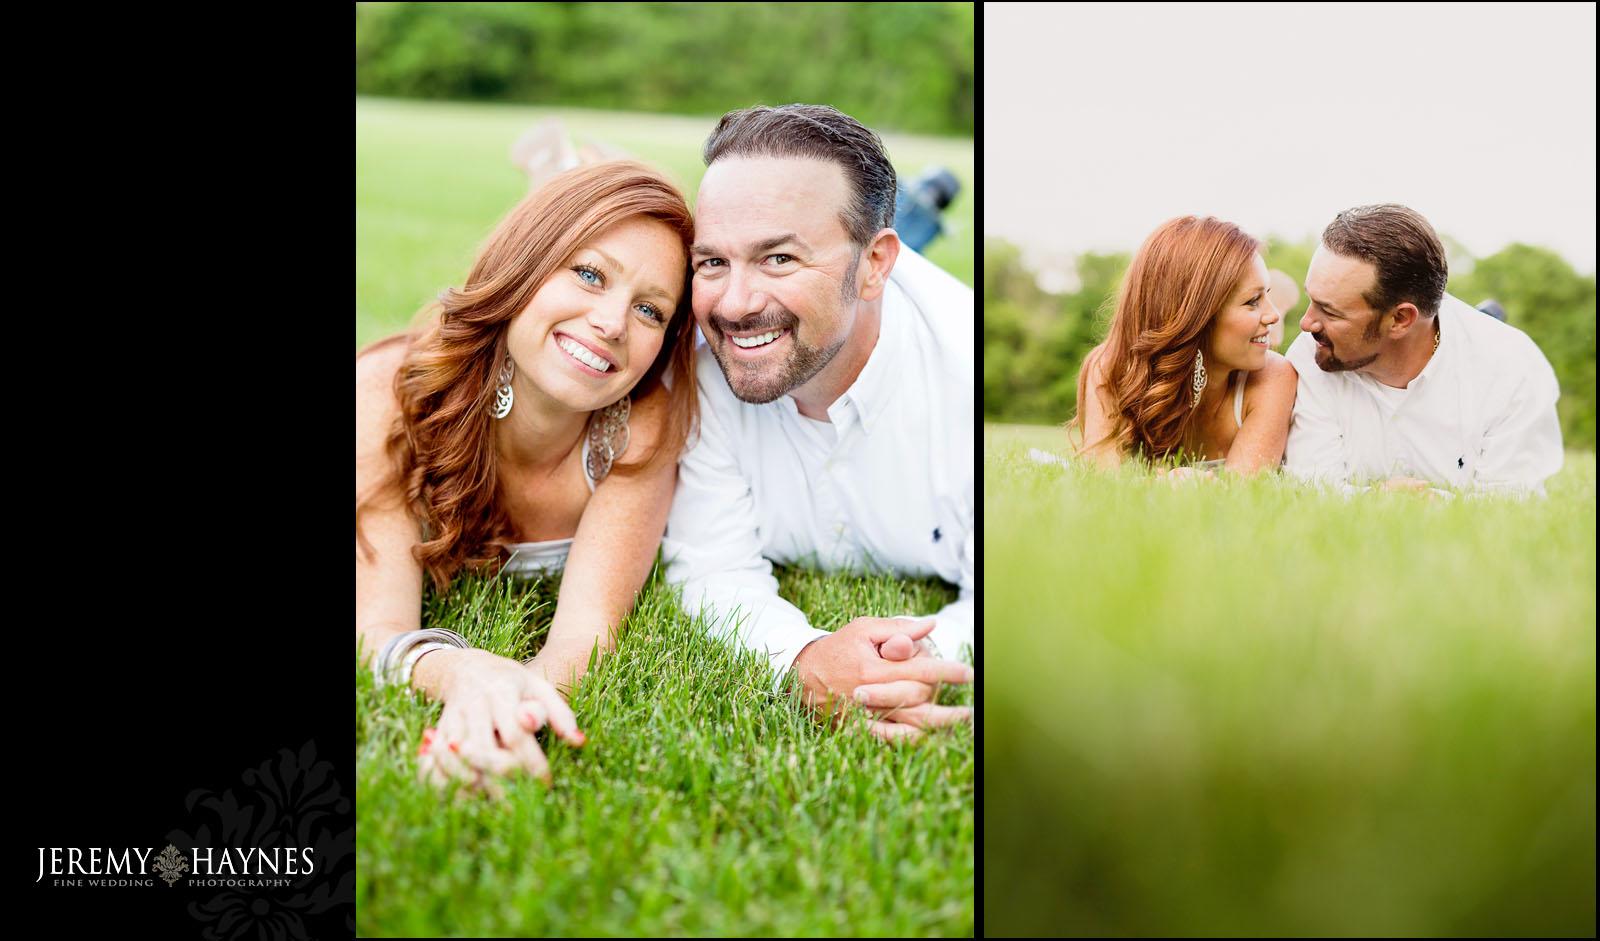 Jason + Morgan Falls Park Pendleton Engagement 14.jpg